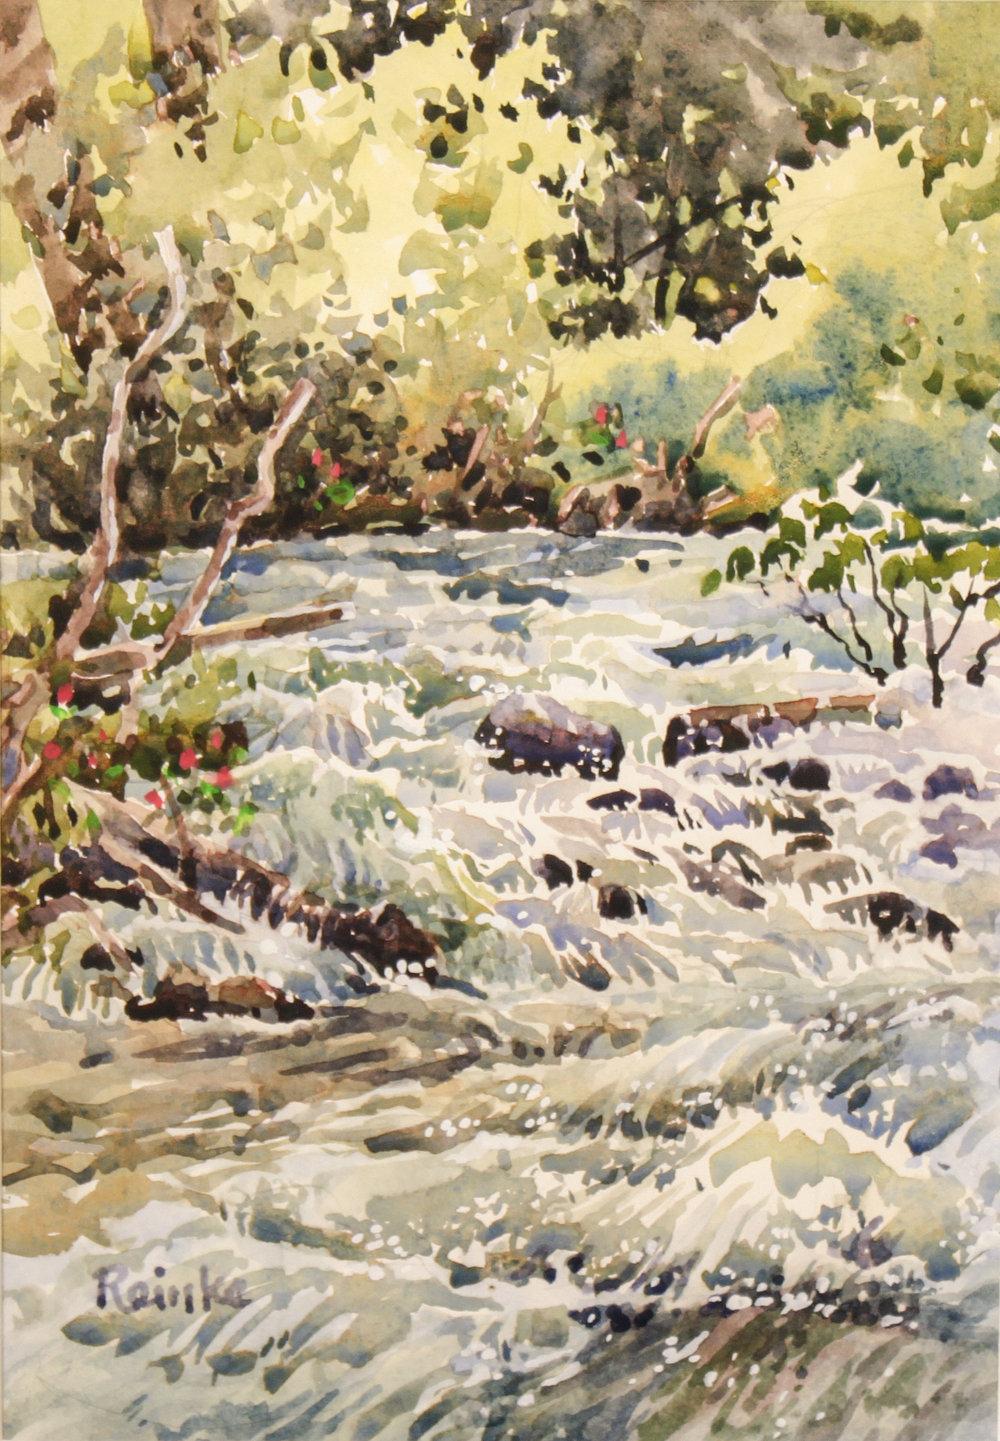 """WALLOWA RIVER (WALLOWA LAKE)"" watercolor 10""x7"" $550."